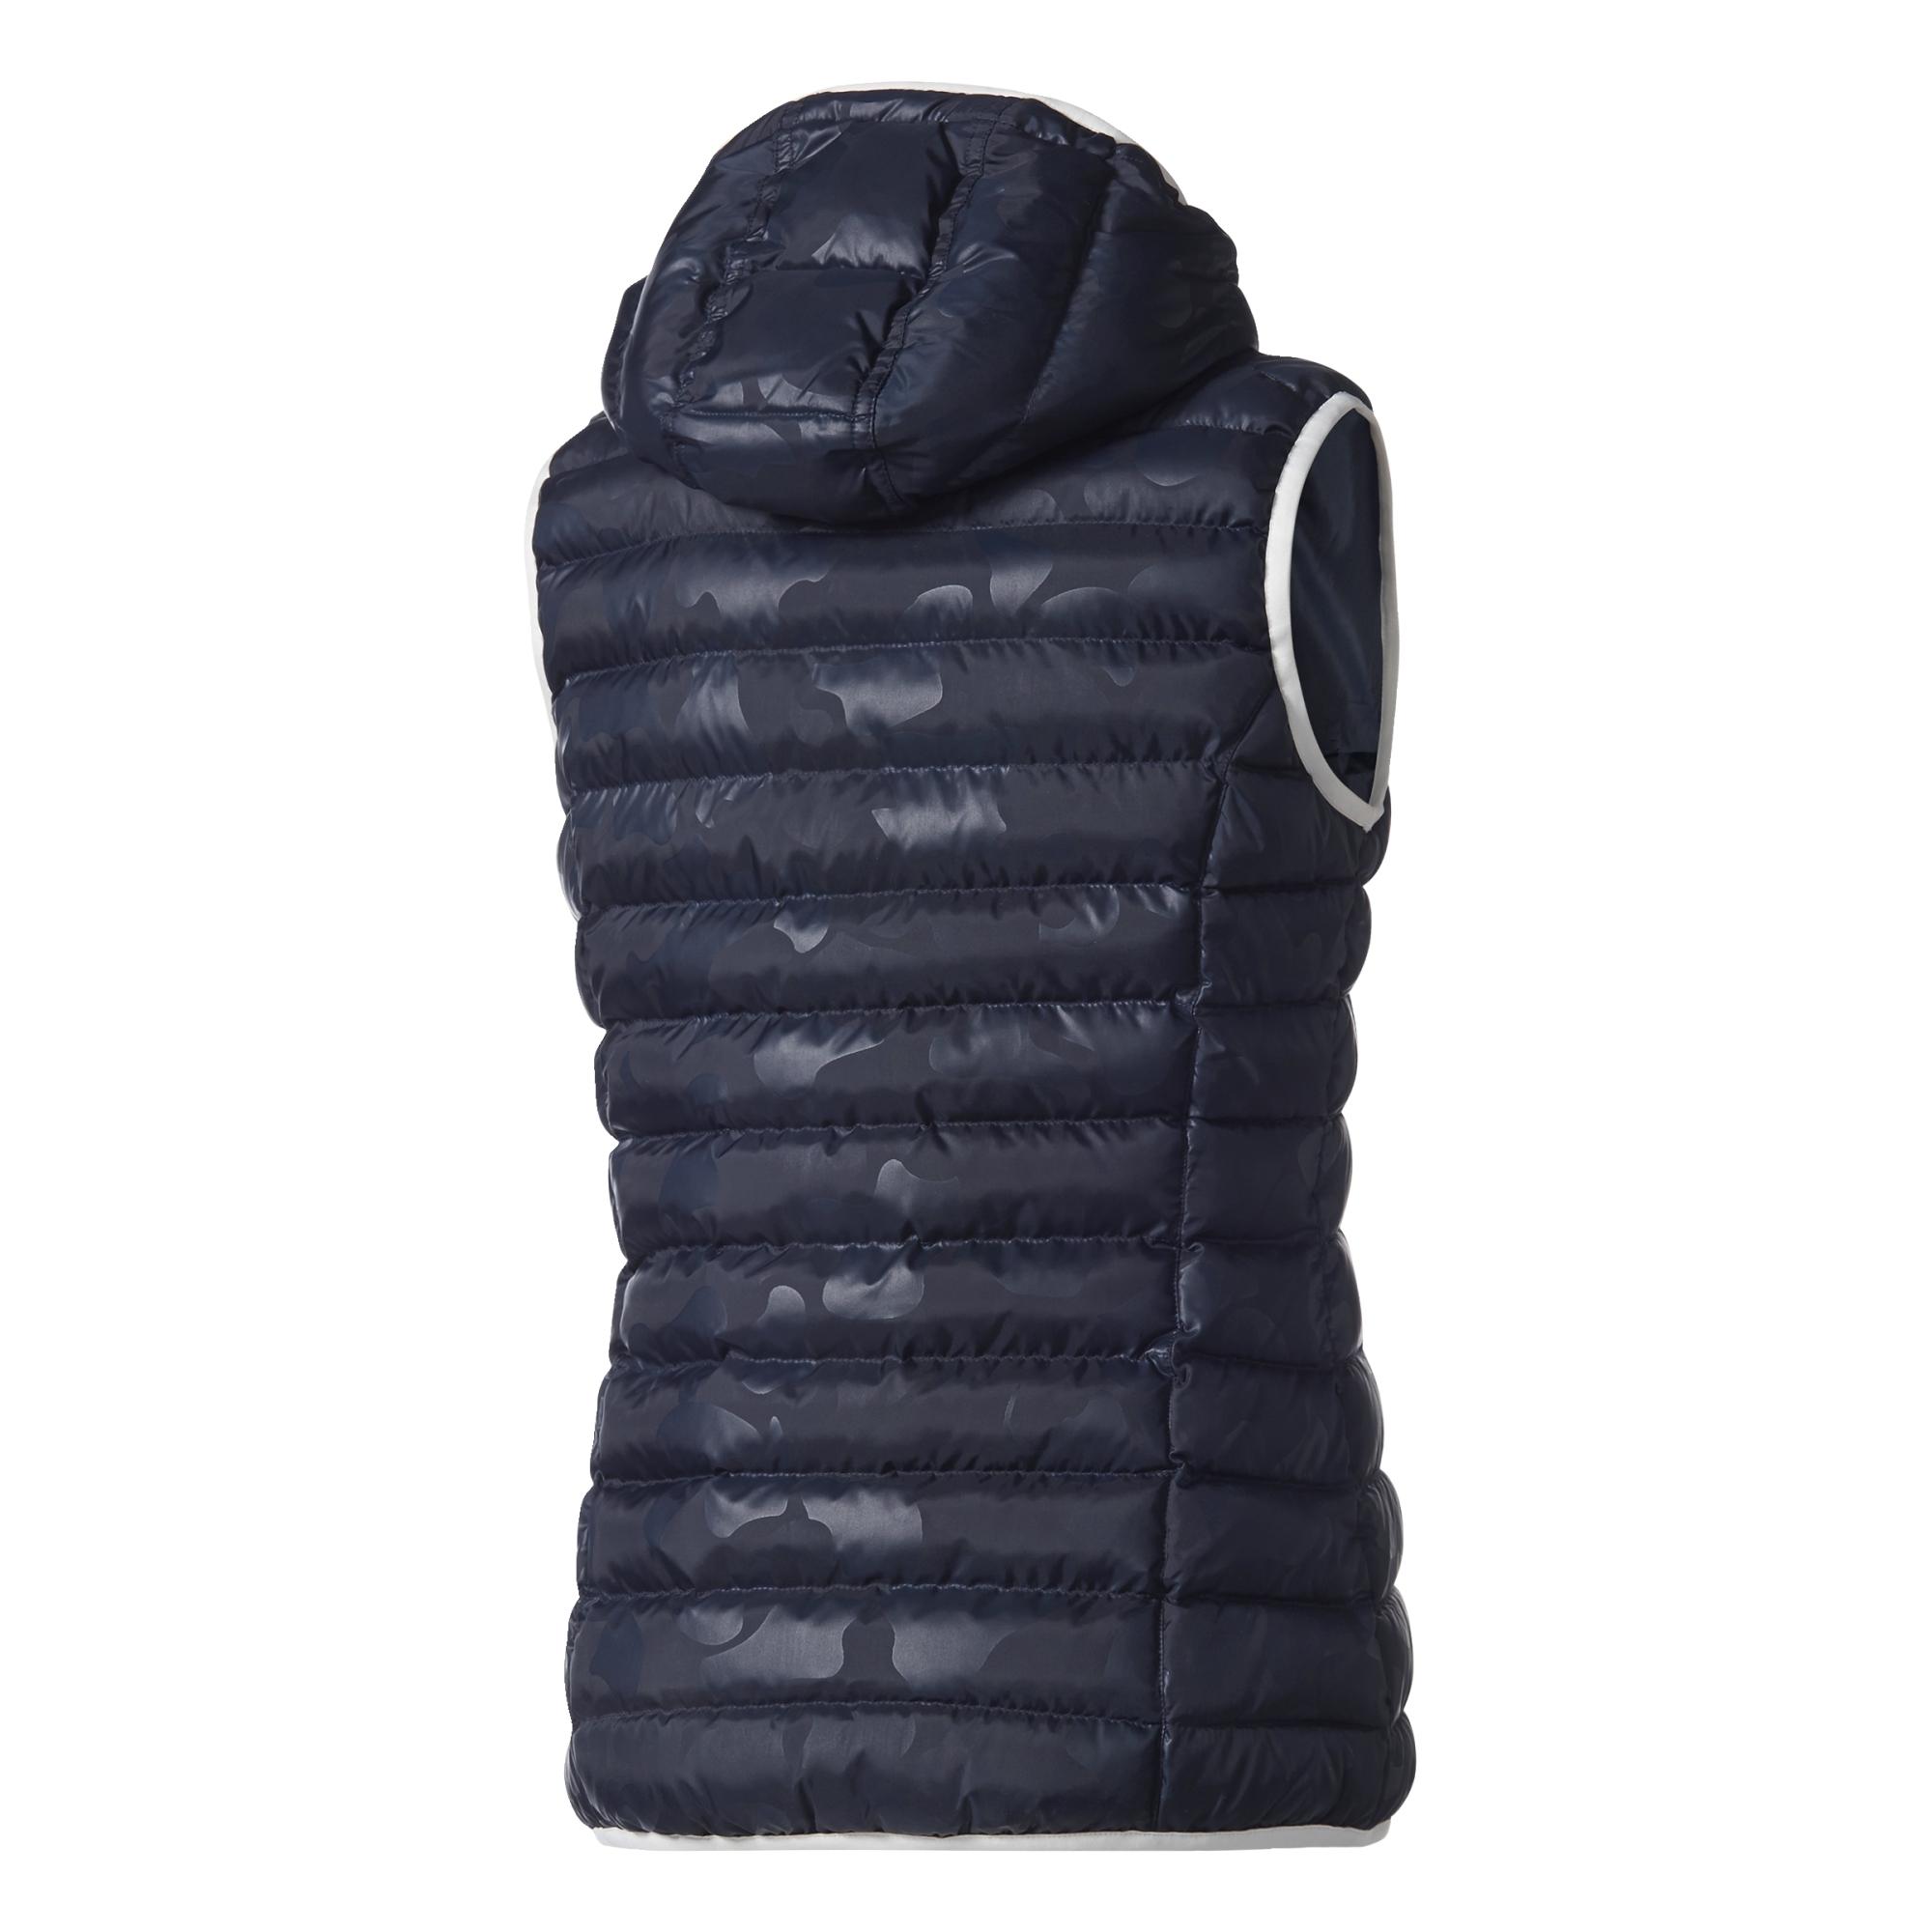 9e44480c22d5 bezrękawnik adidas Slim Vest BQ7494 · bezrękawnik adidas Slim Vest BQ7494  ...